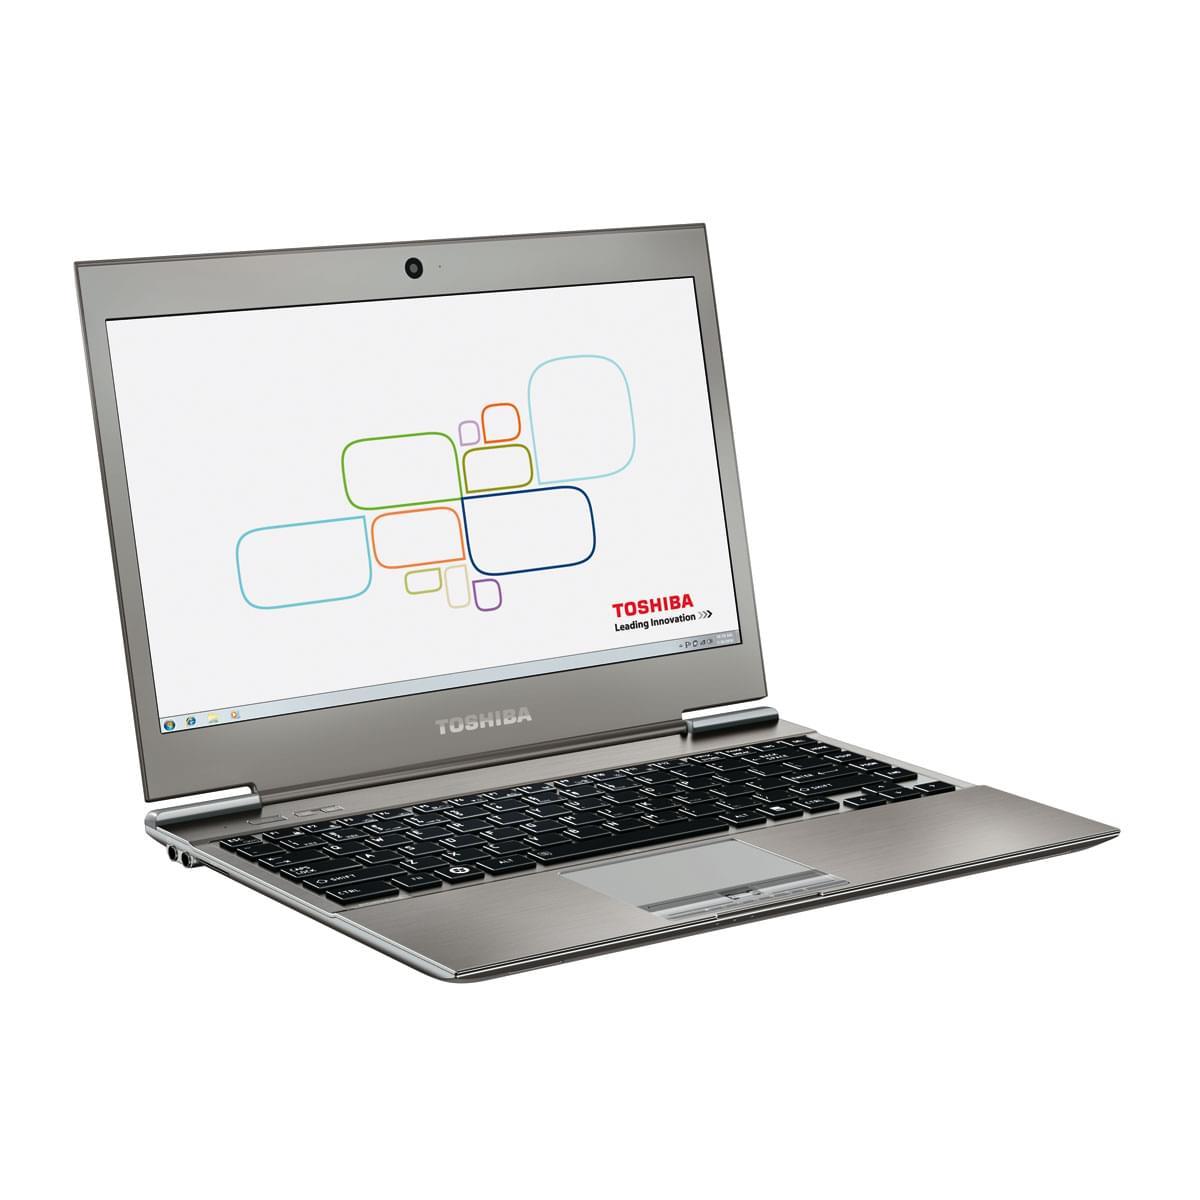 Toshiba PT235E-03Q04CFR - PC portable Toshiba - Cybertek.fr - 0